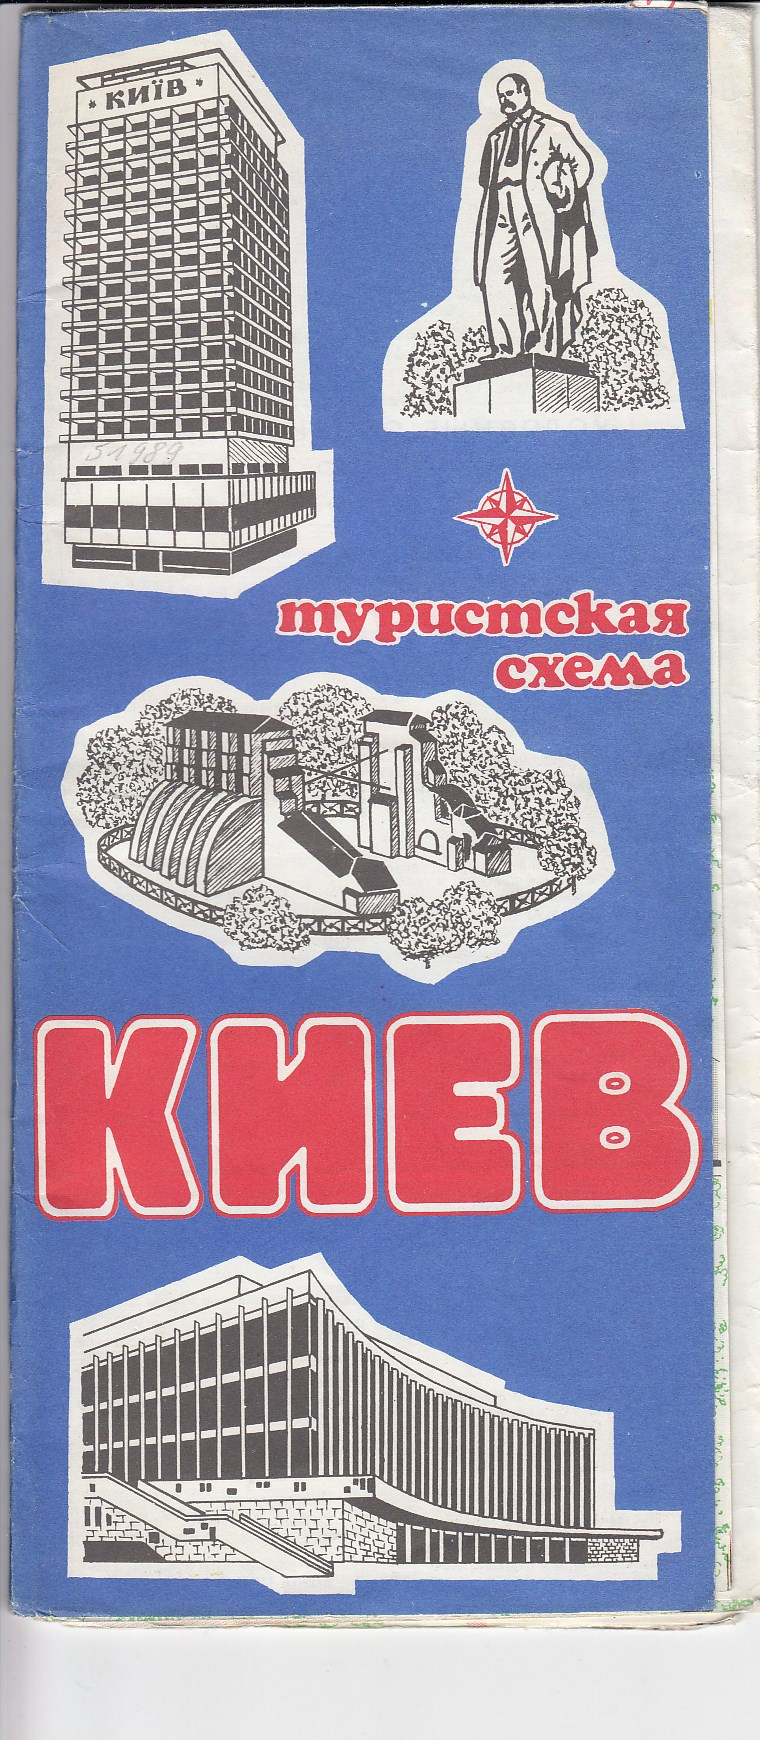 Kueb - Kiew - mypucmckaj cxema.